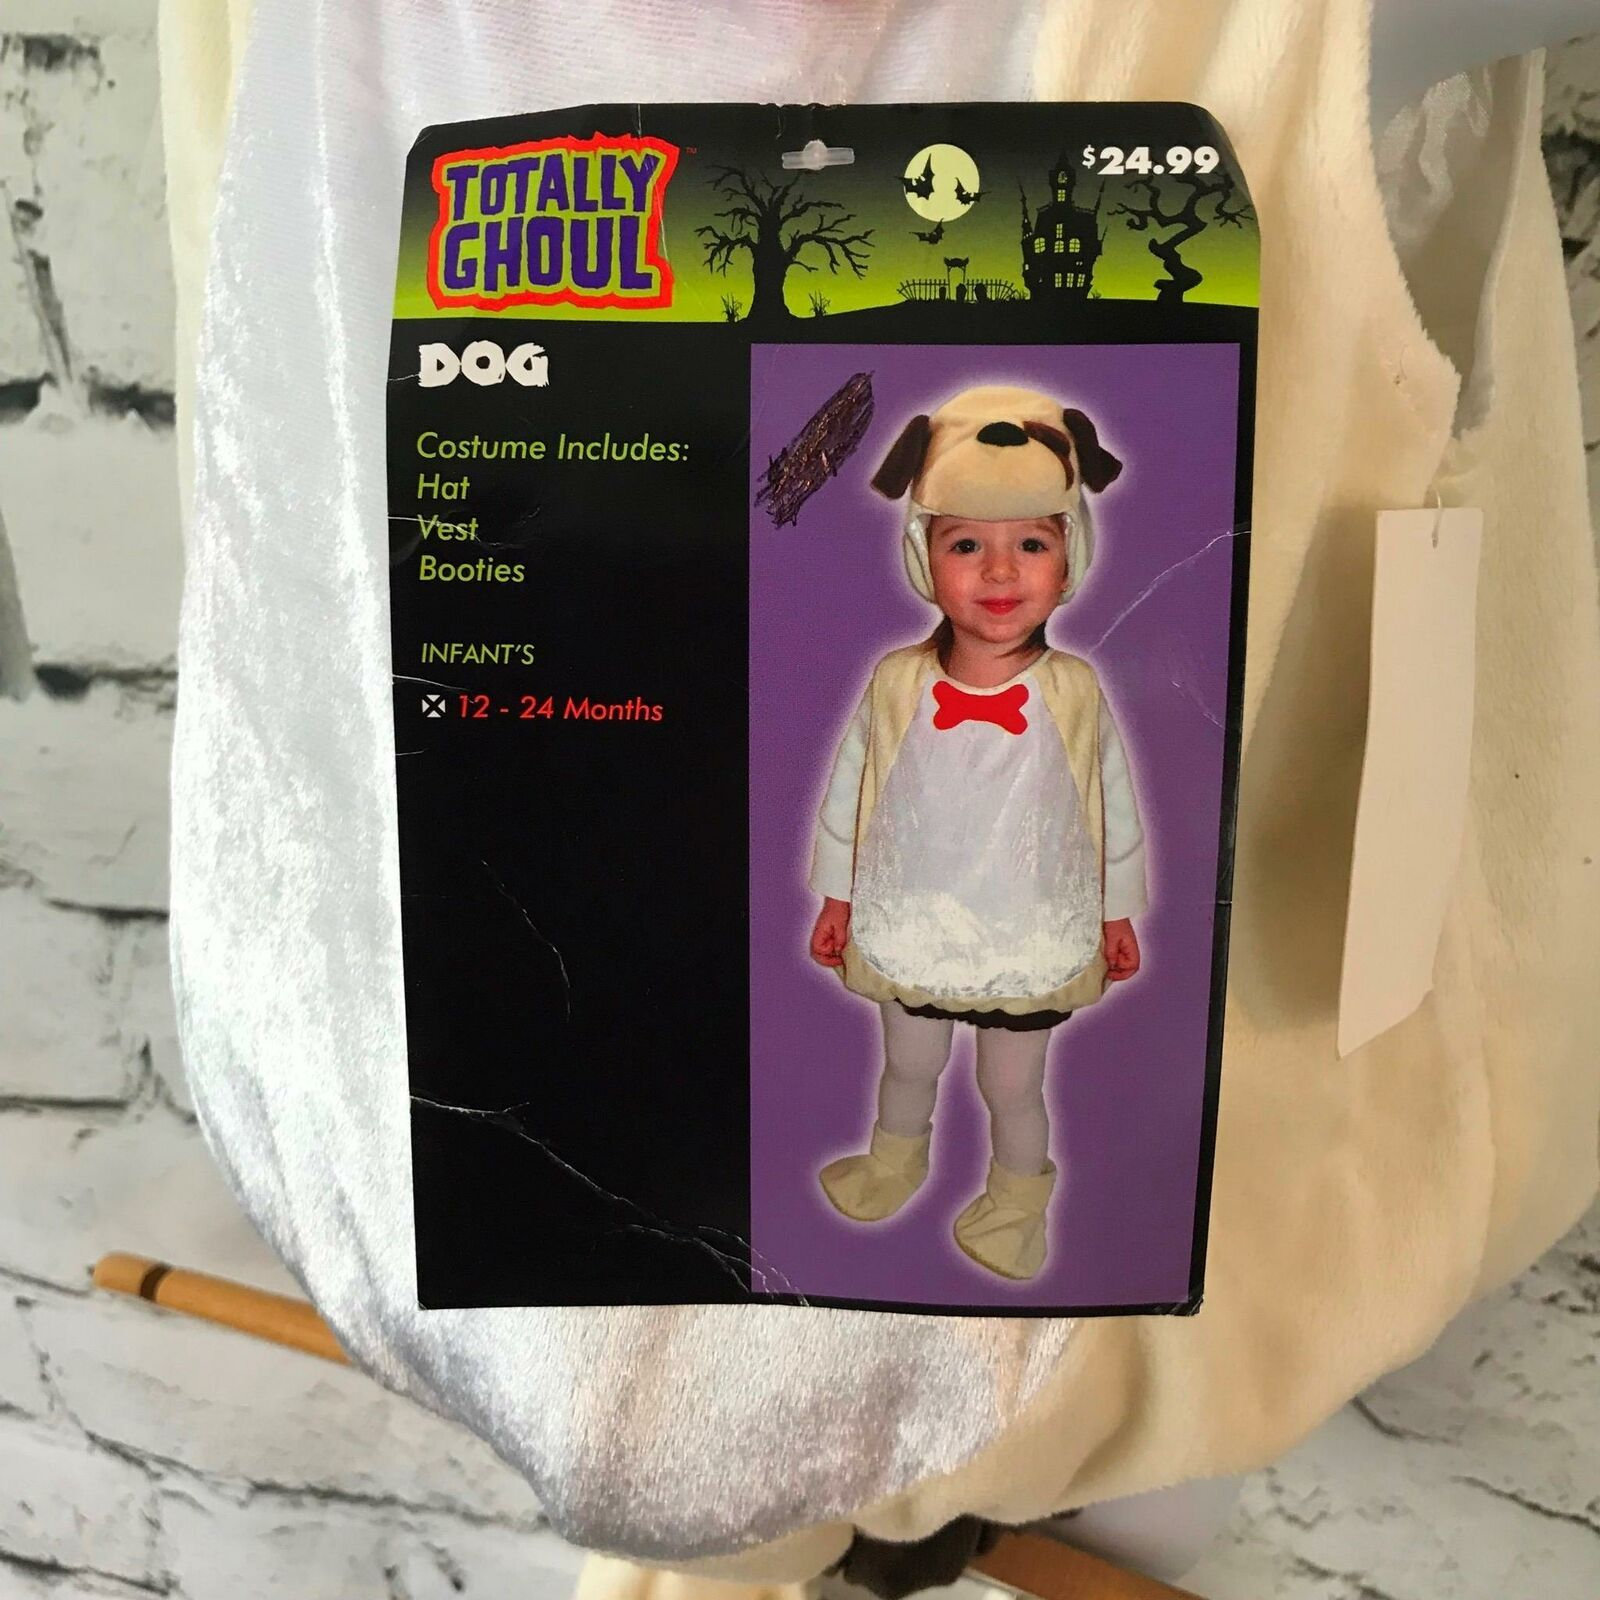 Totally Ghoul Cane Costume Neonato Unisex Sz 12-24Mos Felpa Halloween Vestirsi - $24.73